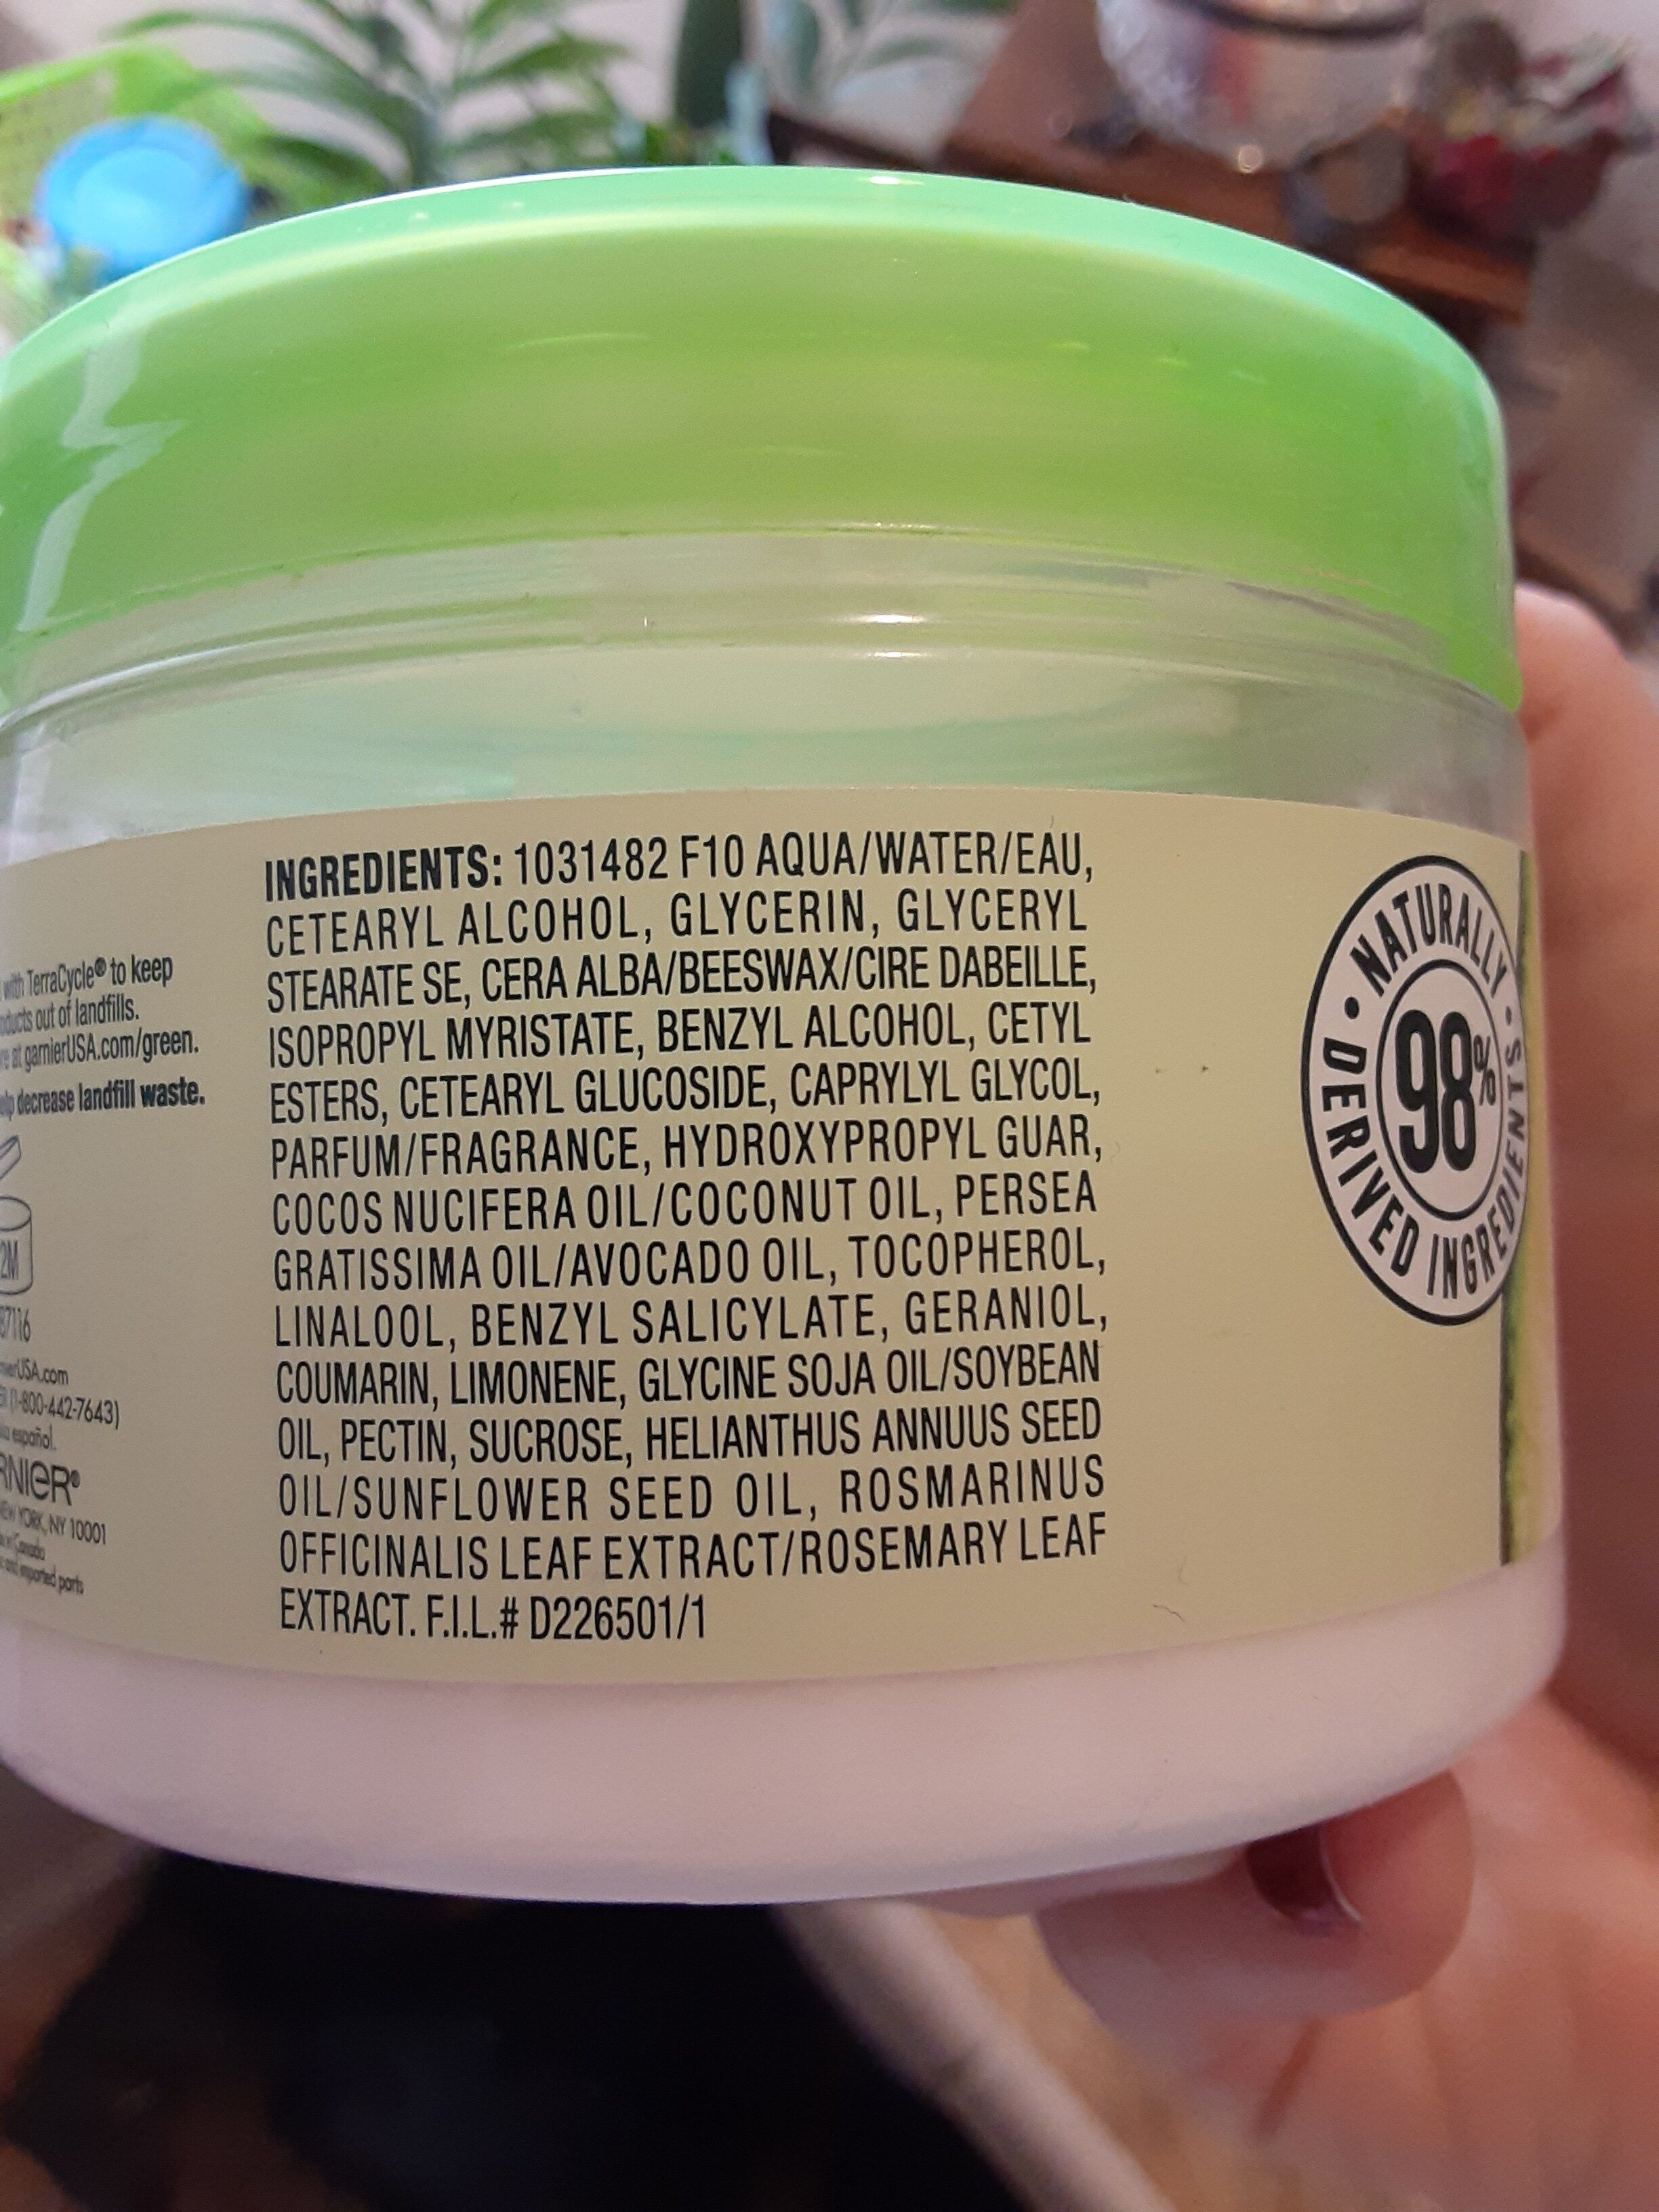 garnier curl treat - Ingredients - en